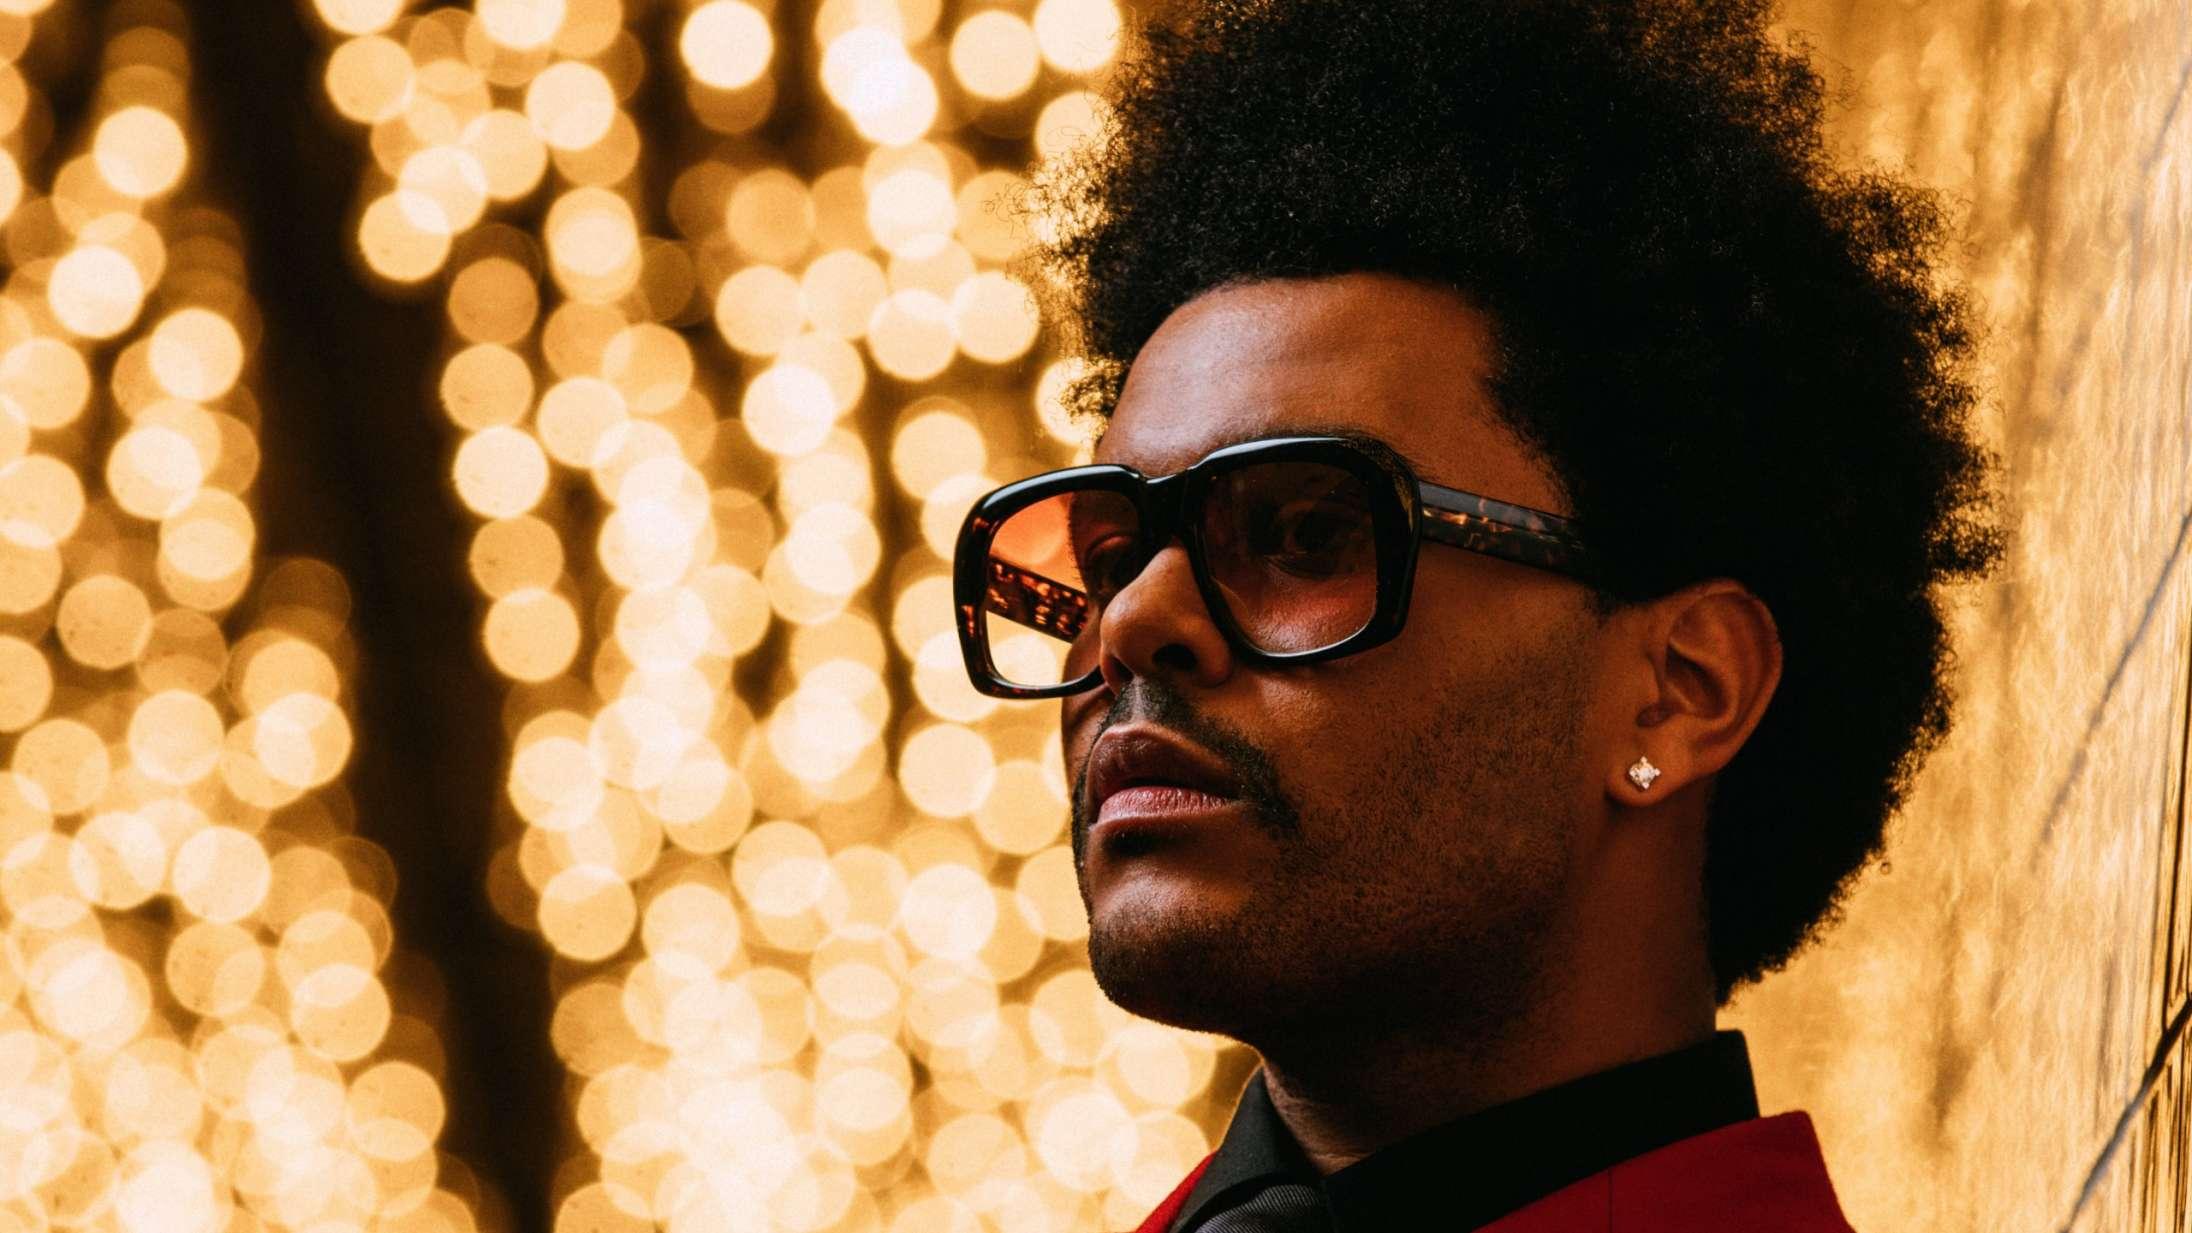 Time kårer verdens 100 mest indflydelsesrige personer –  Megan Thee Stallion, The Weeknd, Michael B. Jordan på listen